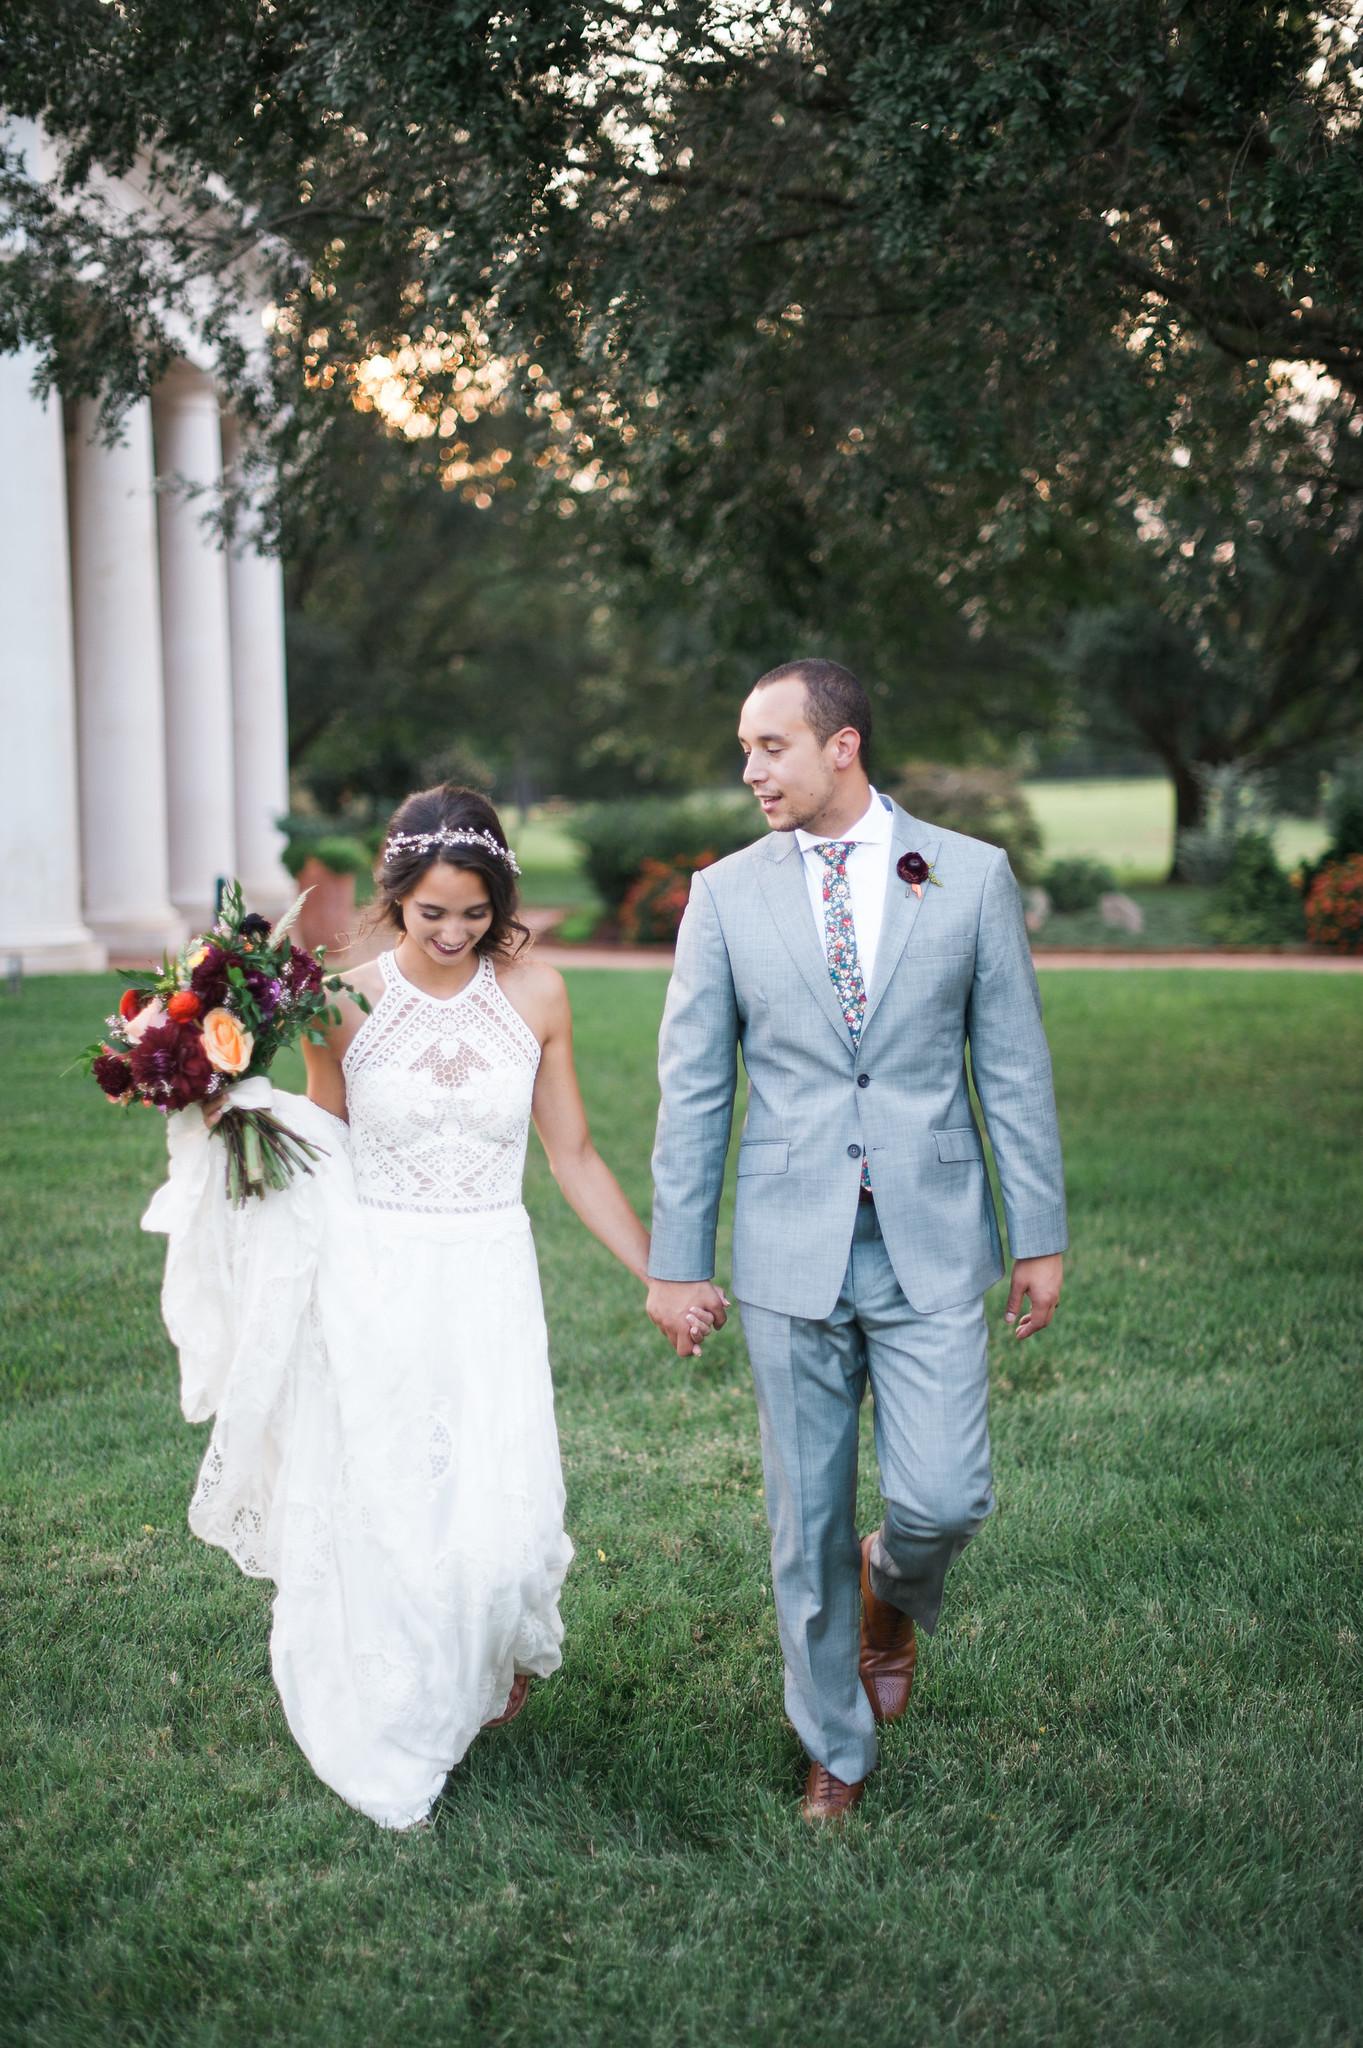 thomas-wedding-341-X4.jpg